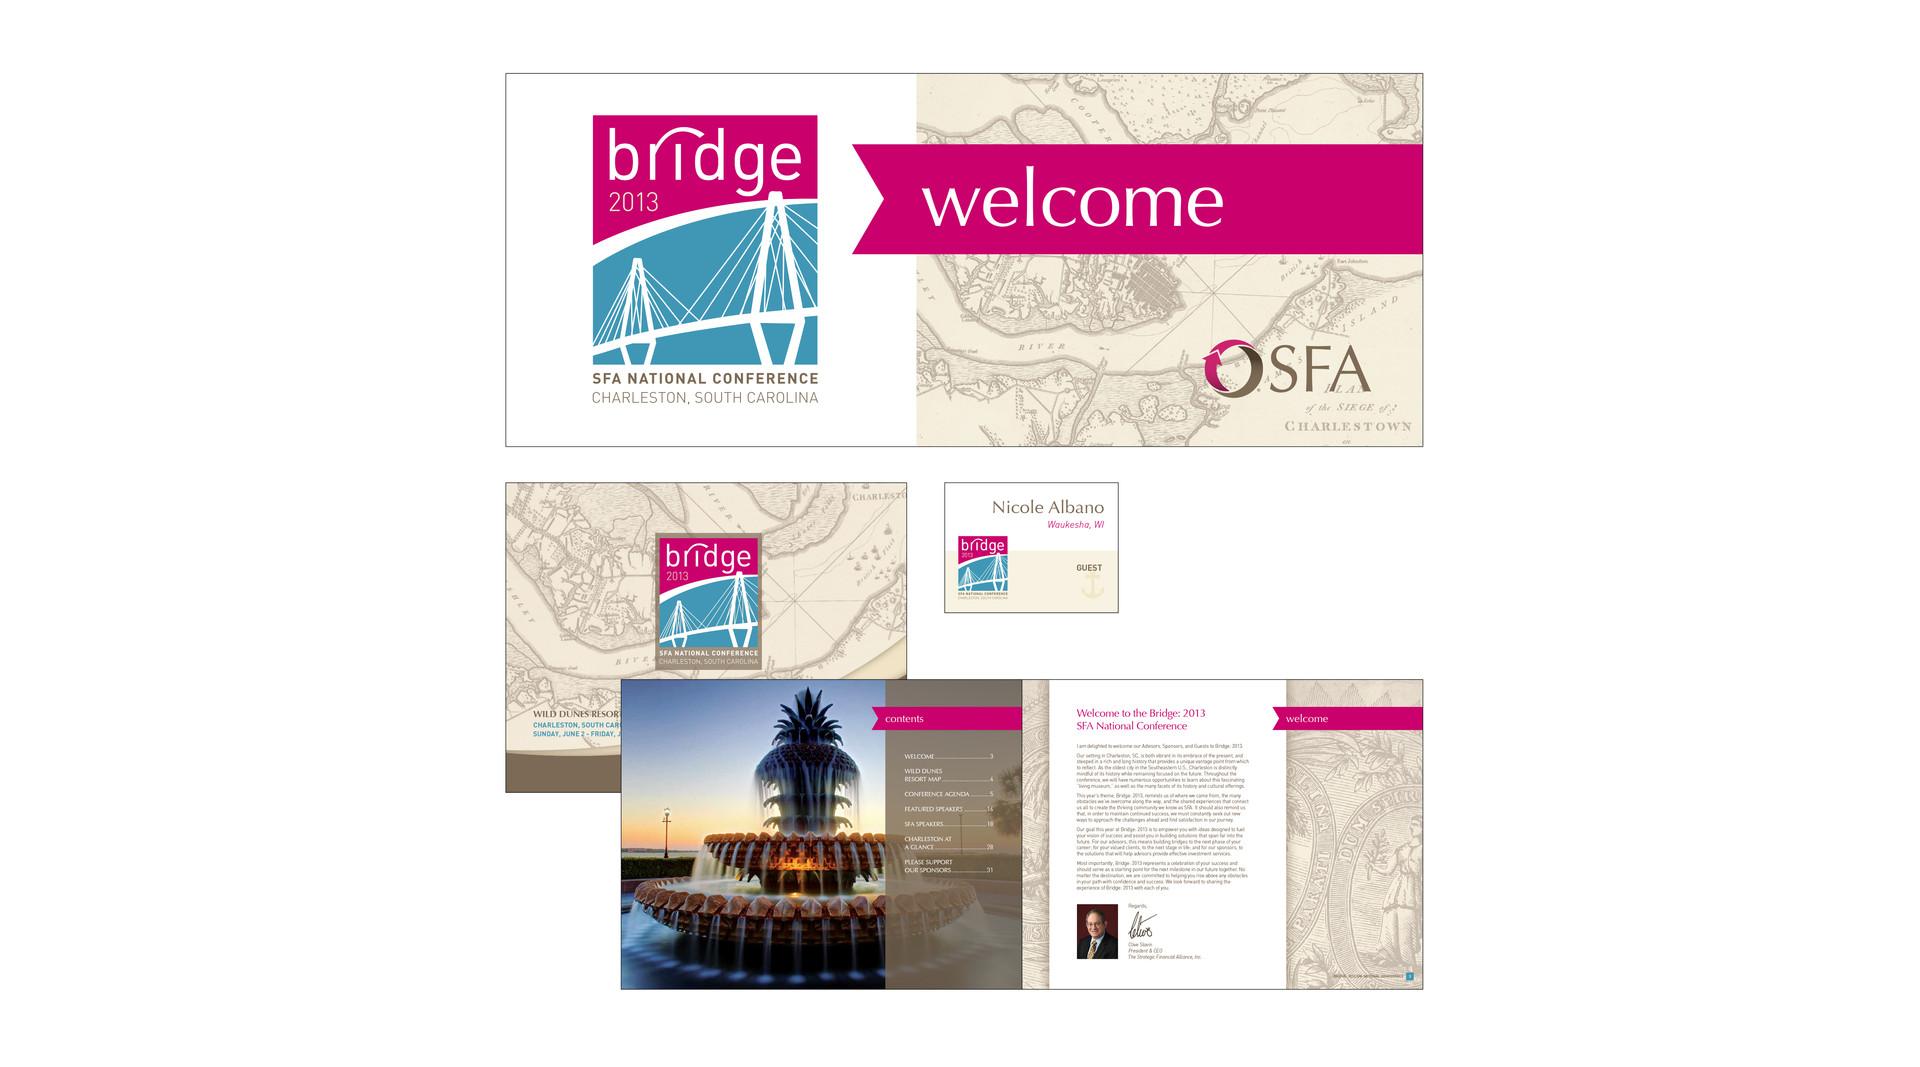 conference design & materials